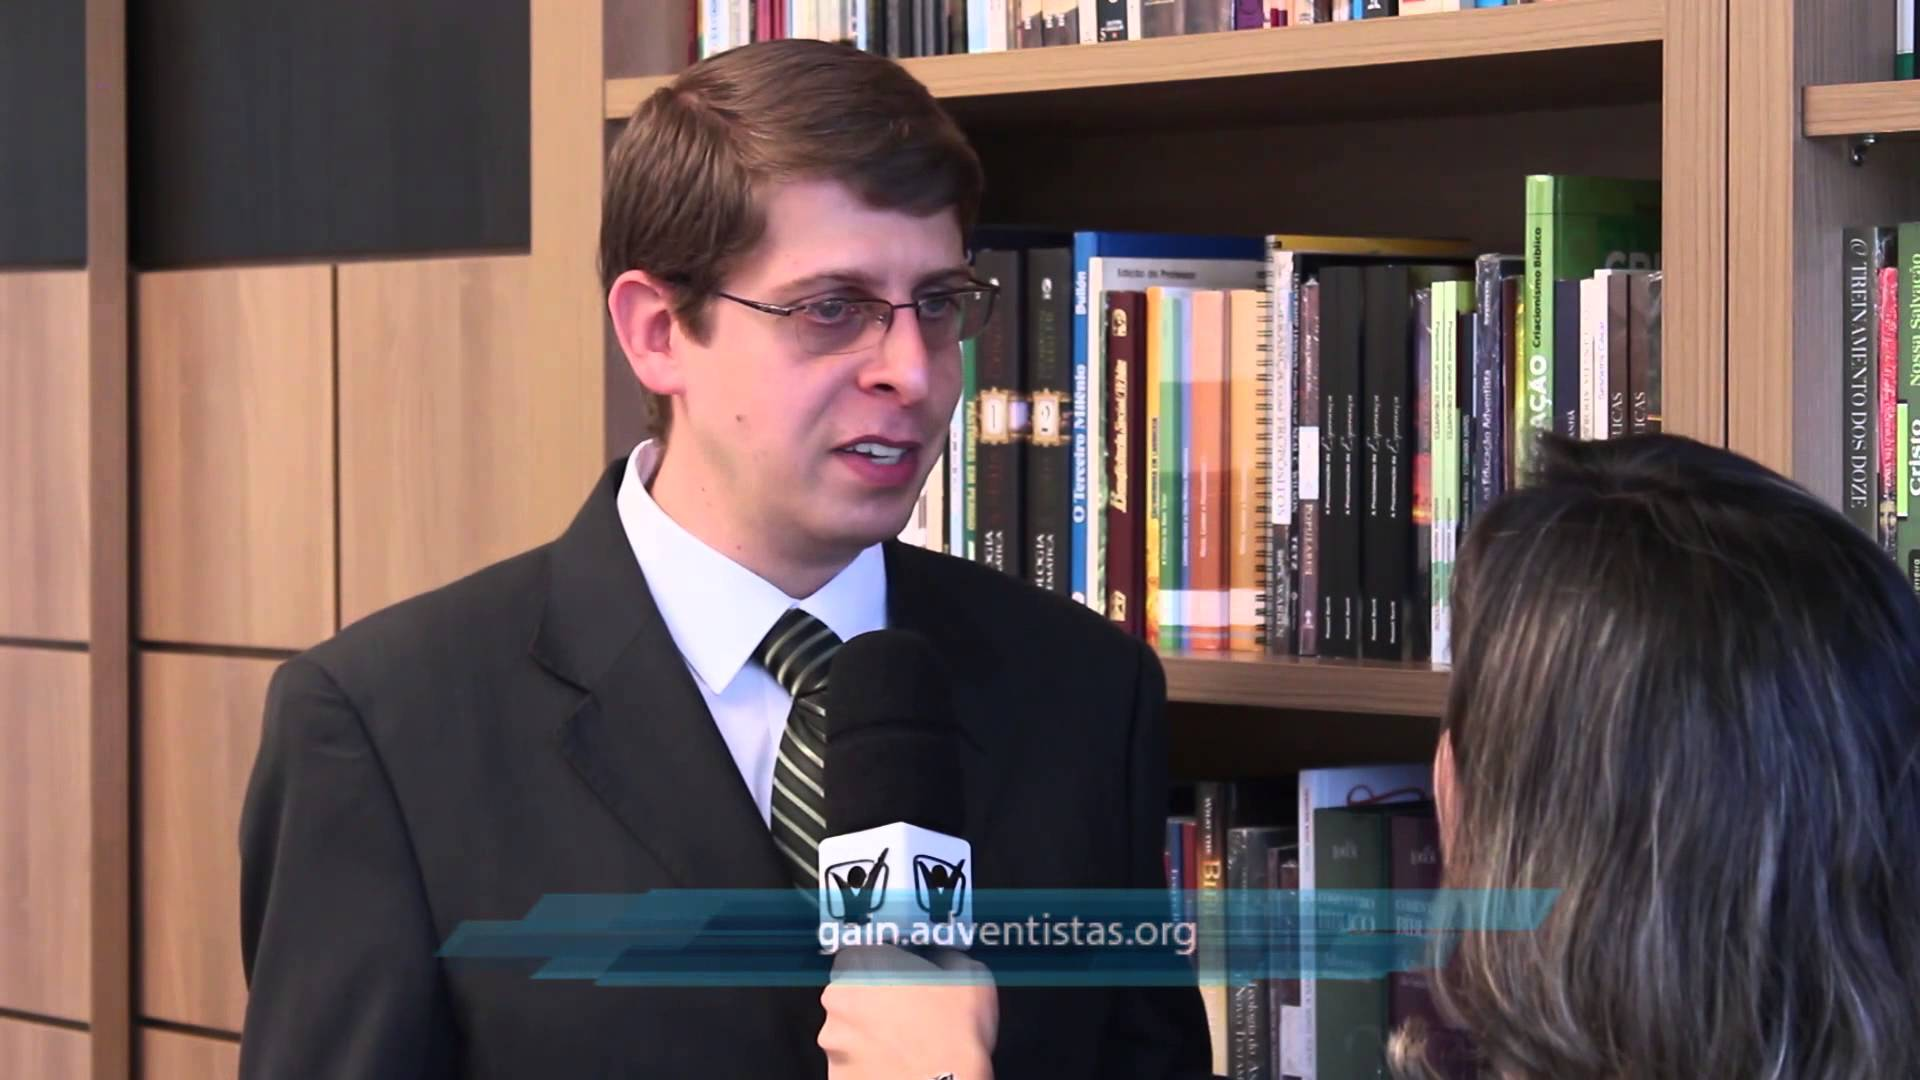 Notícias Adventistas – SAC / GAiN – Pastor Rafael Rossi